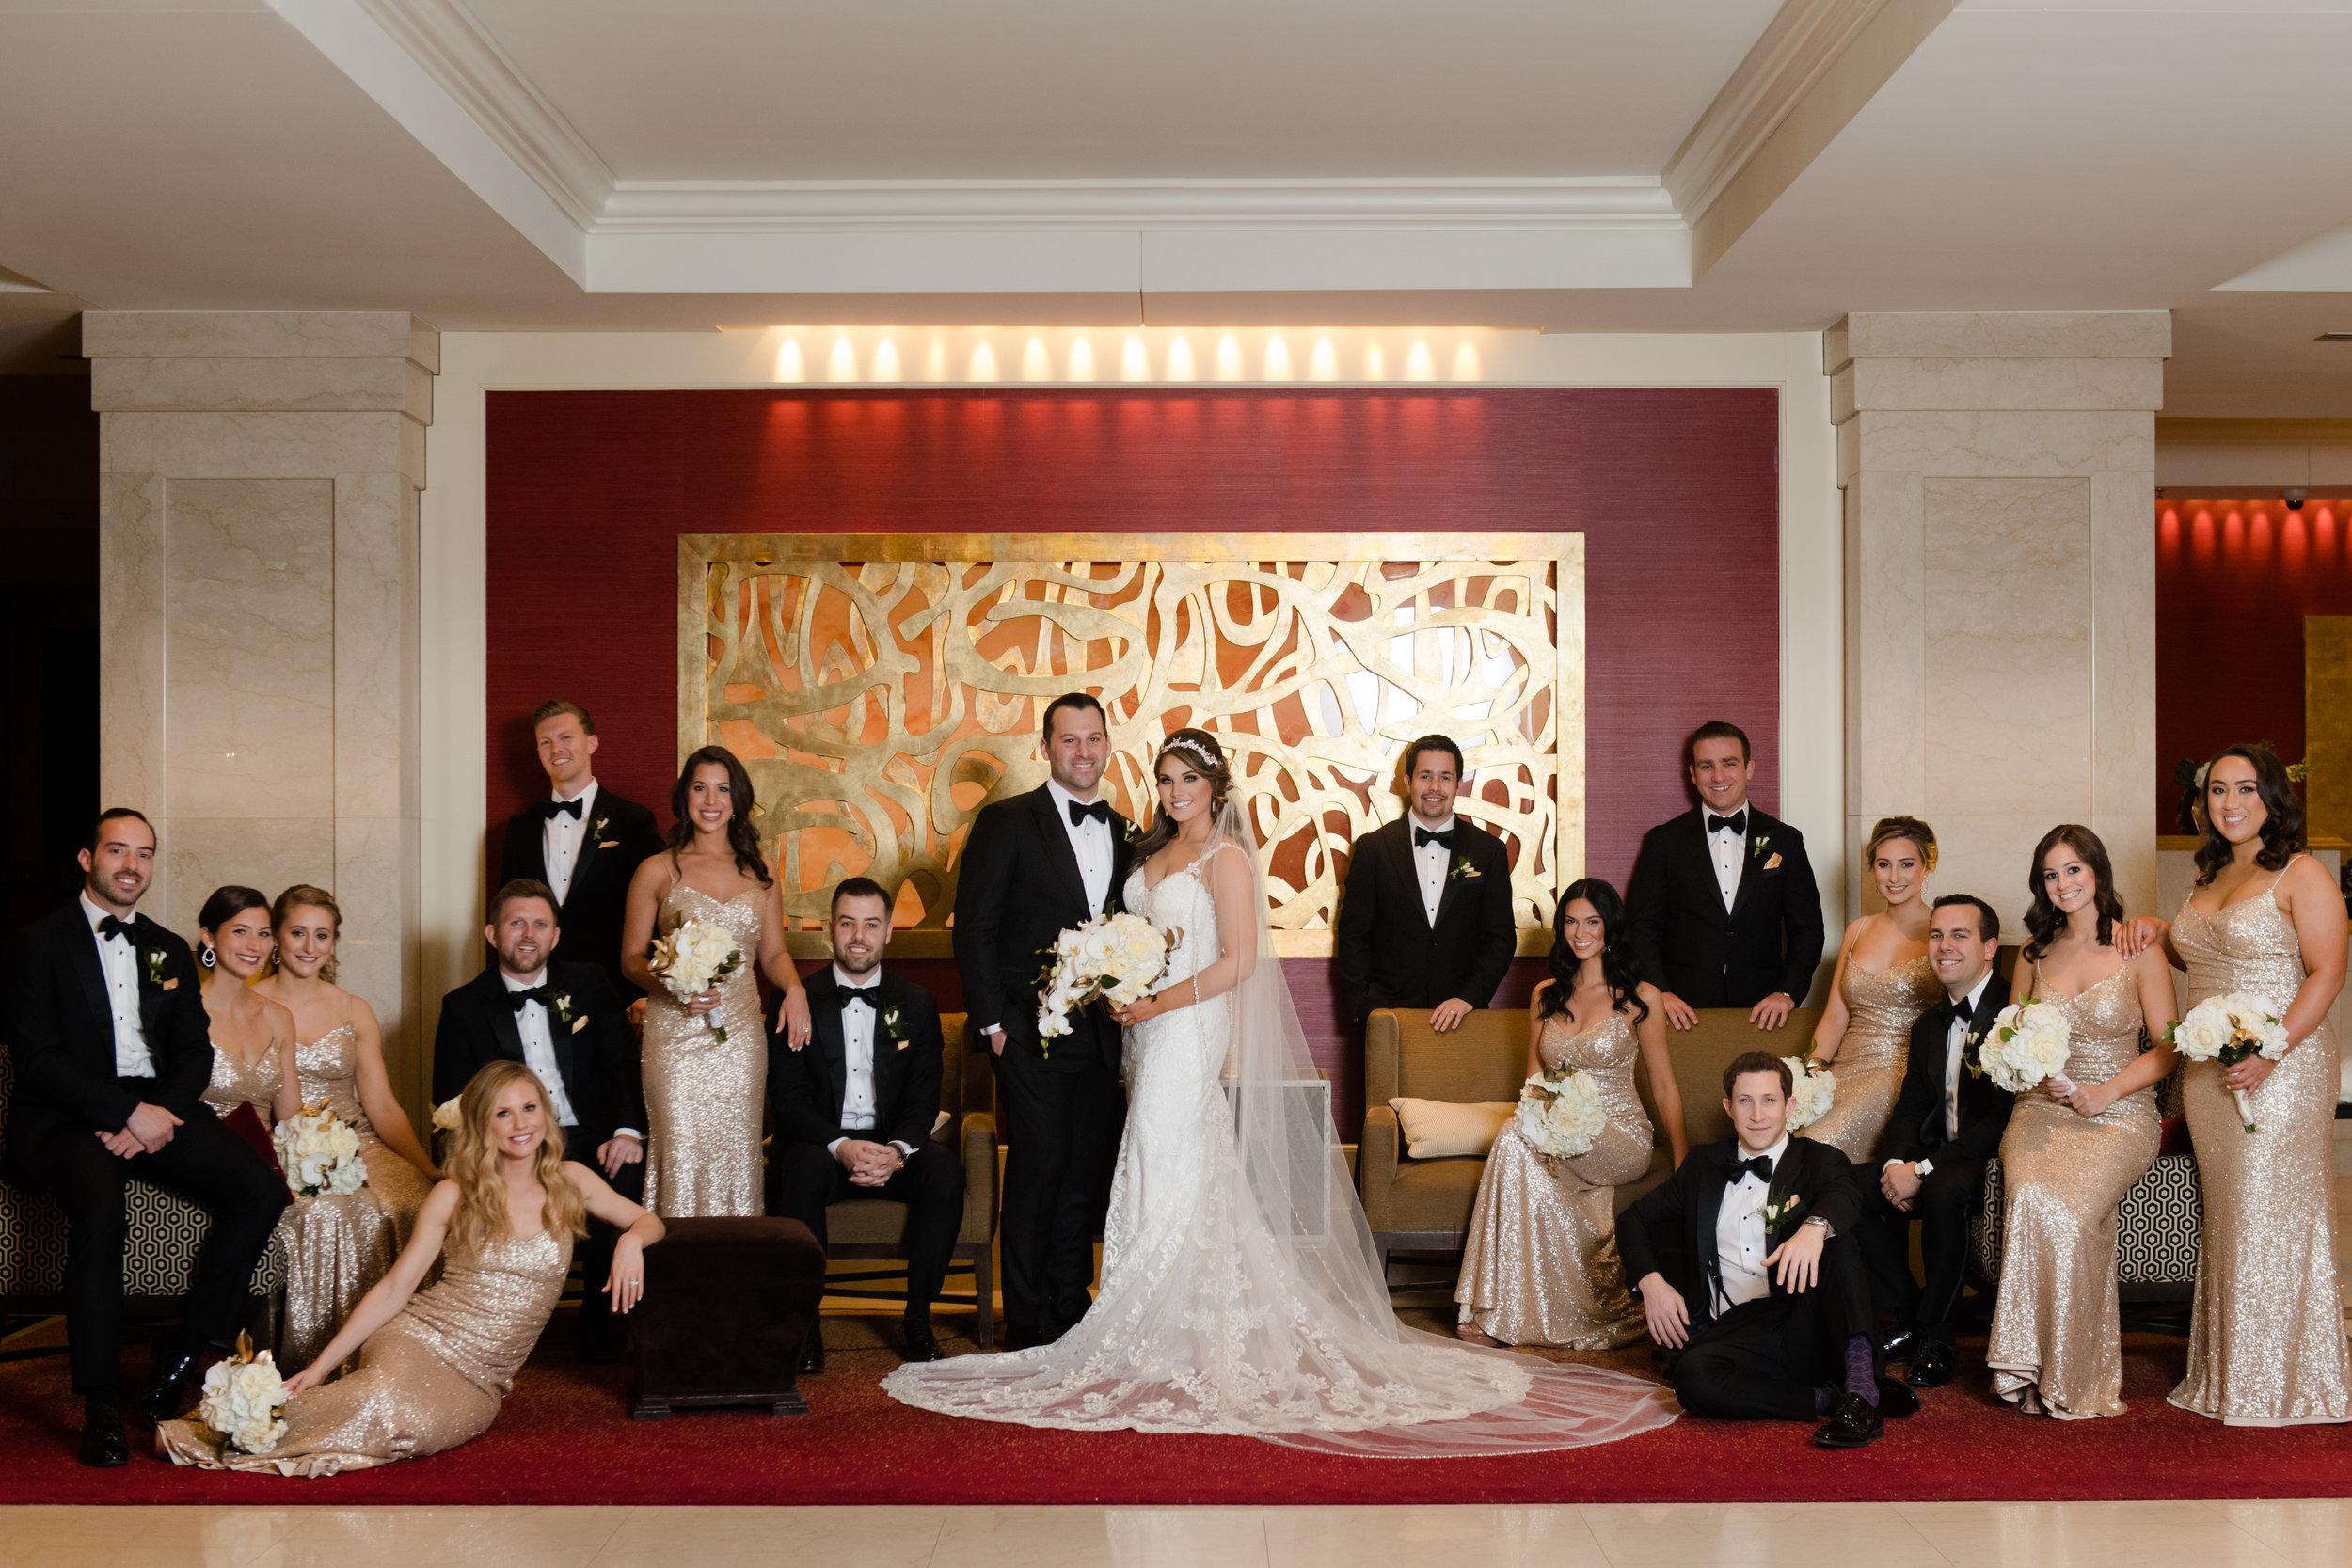 Elegant wedding at the JW Marriott Chicago10.jpg